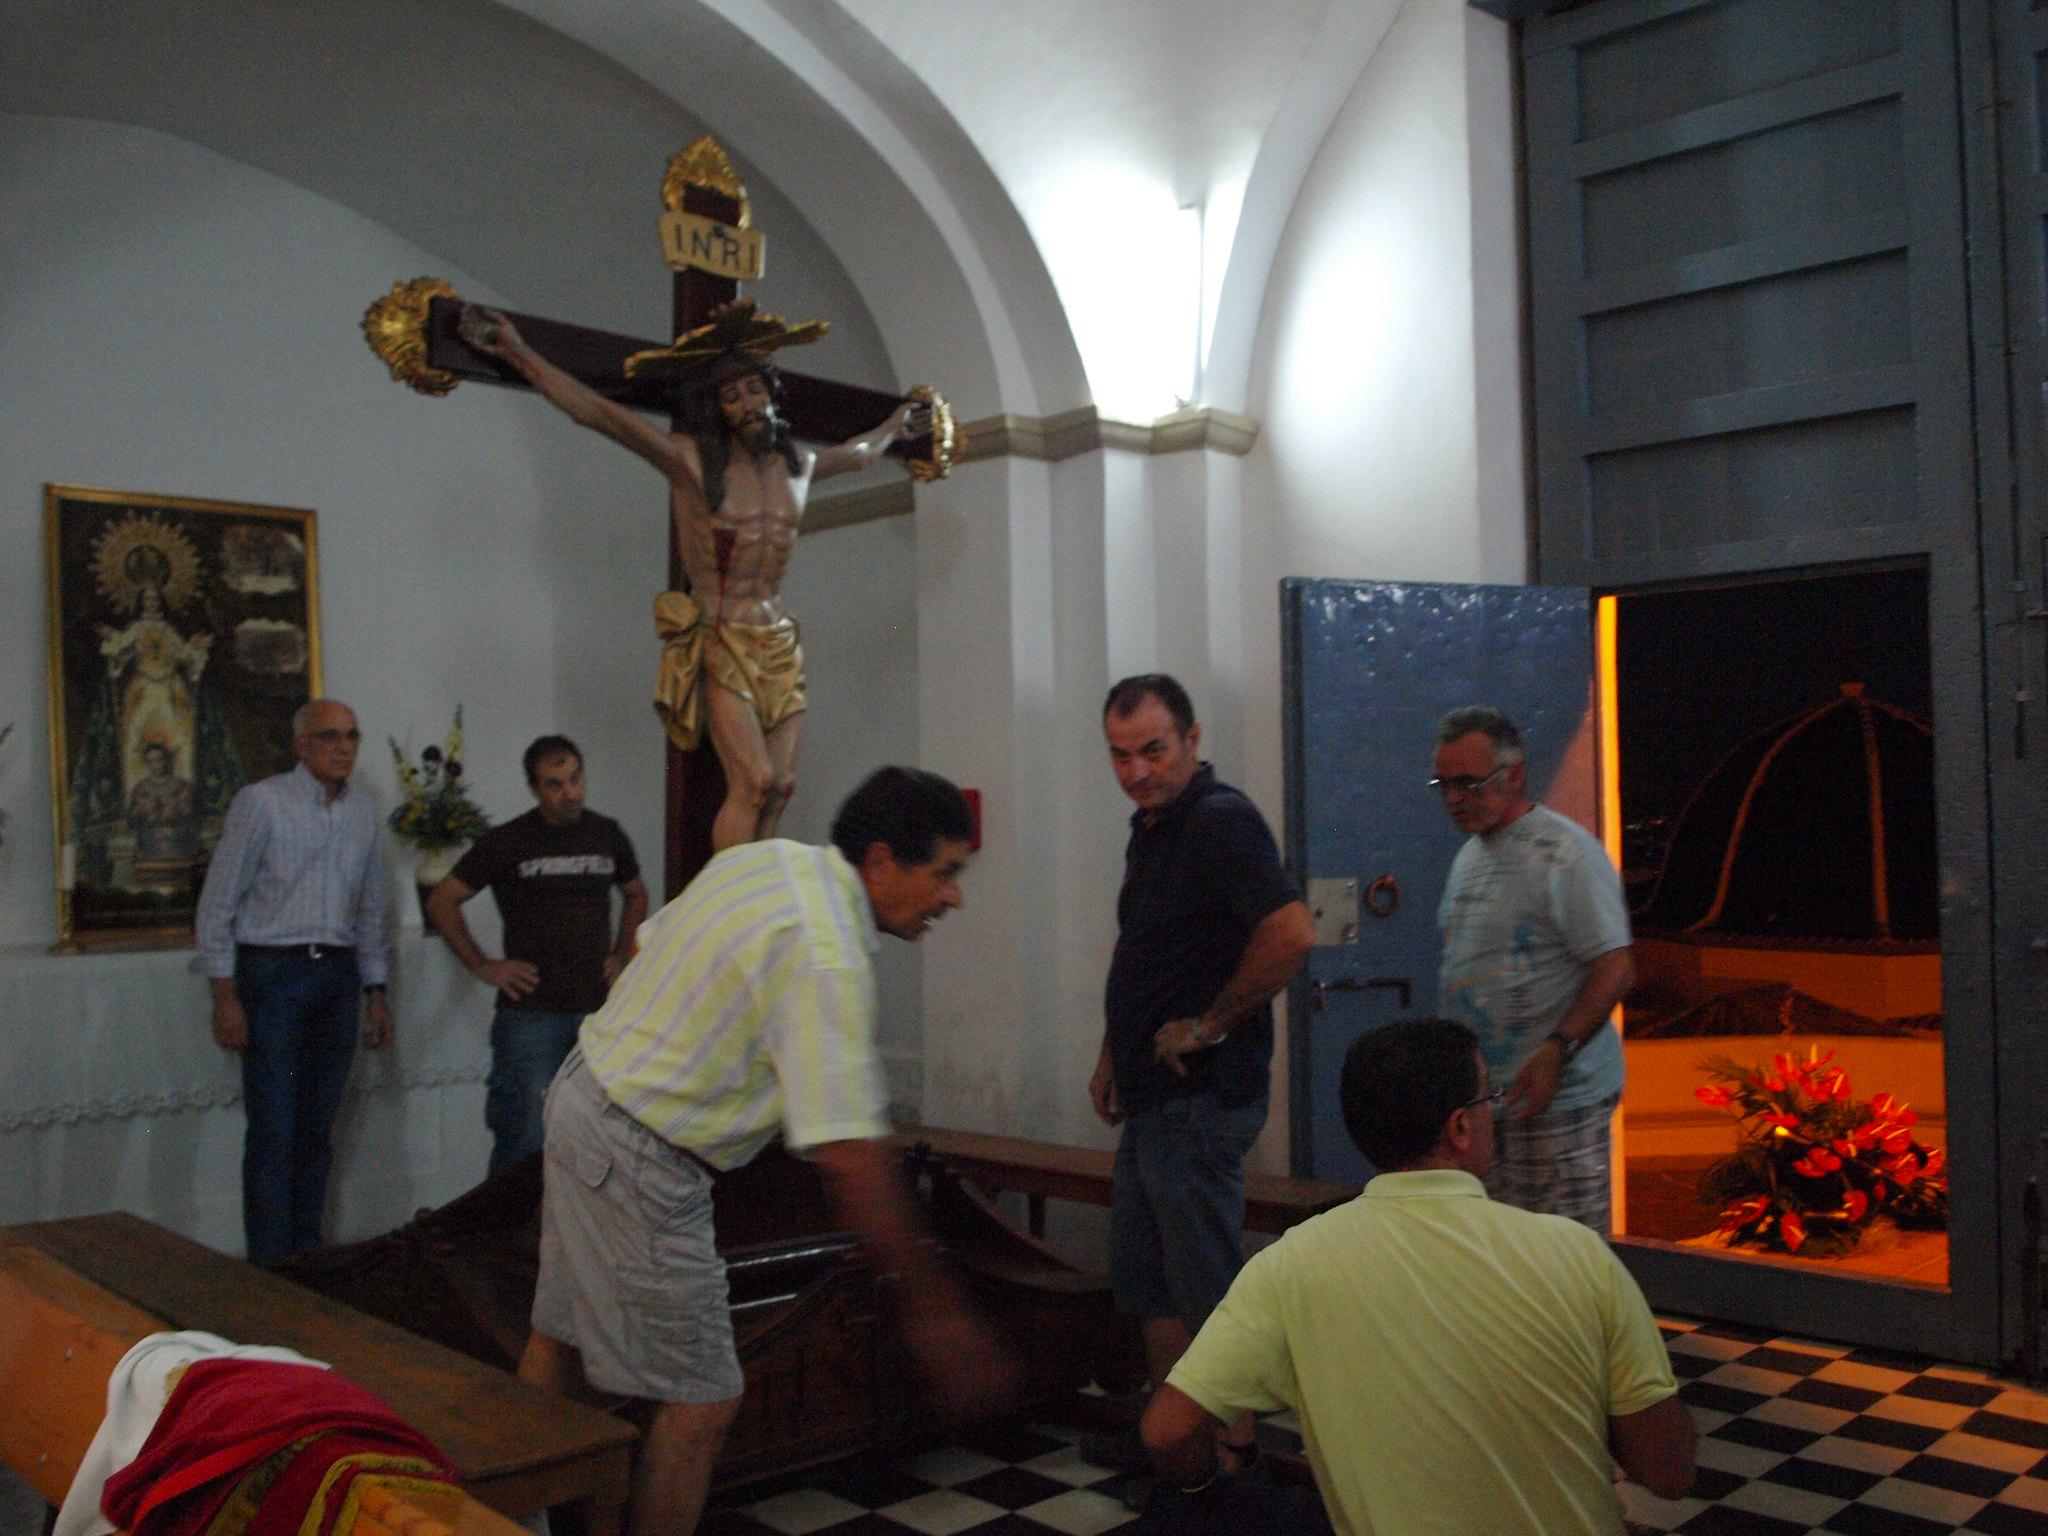 (2014-07-07) - Recogida de Imagen - Paloma Romero Torralba (30)